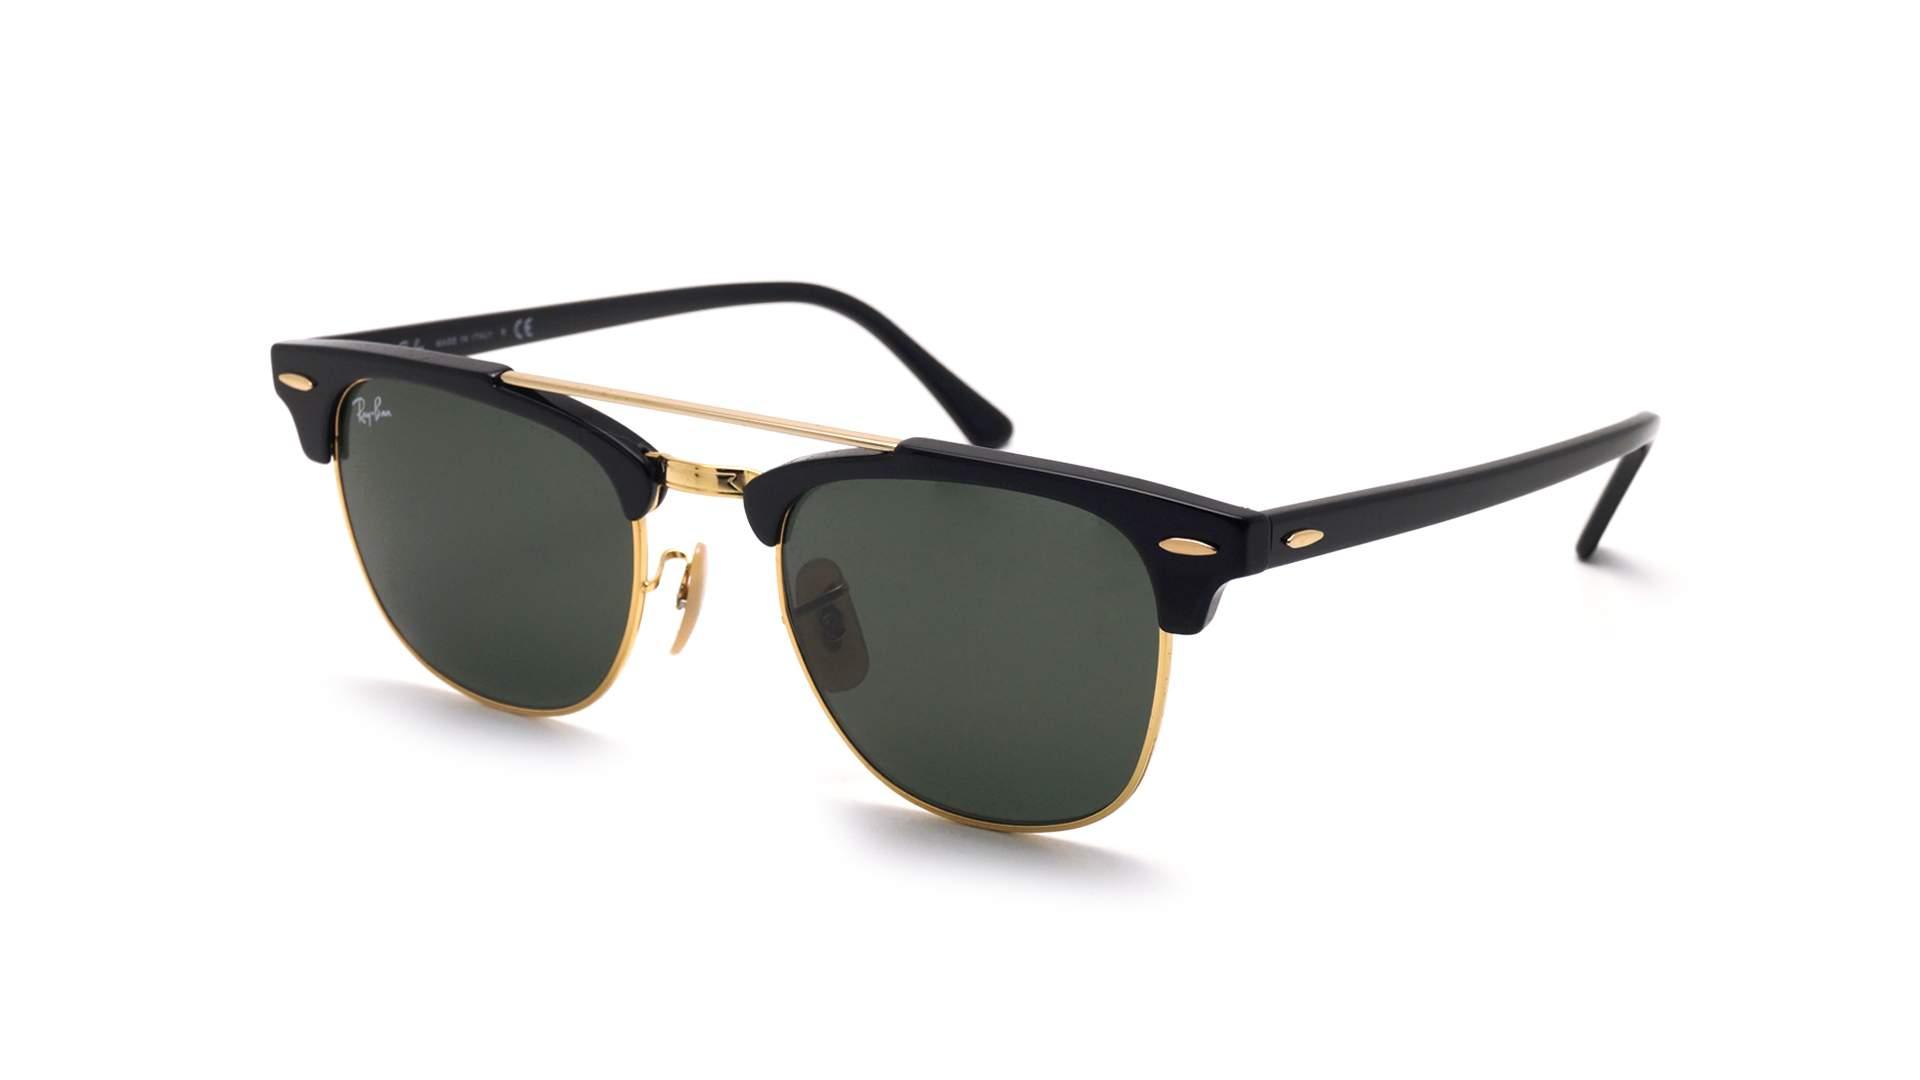 4640987b79a Sunglasses Ray-Ban Clubmaster Double Bridge Black G-15 RB3816 901 51-21  Medium